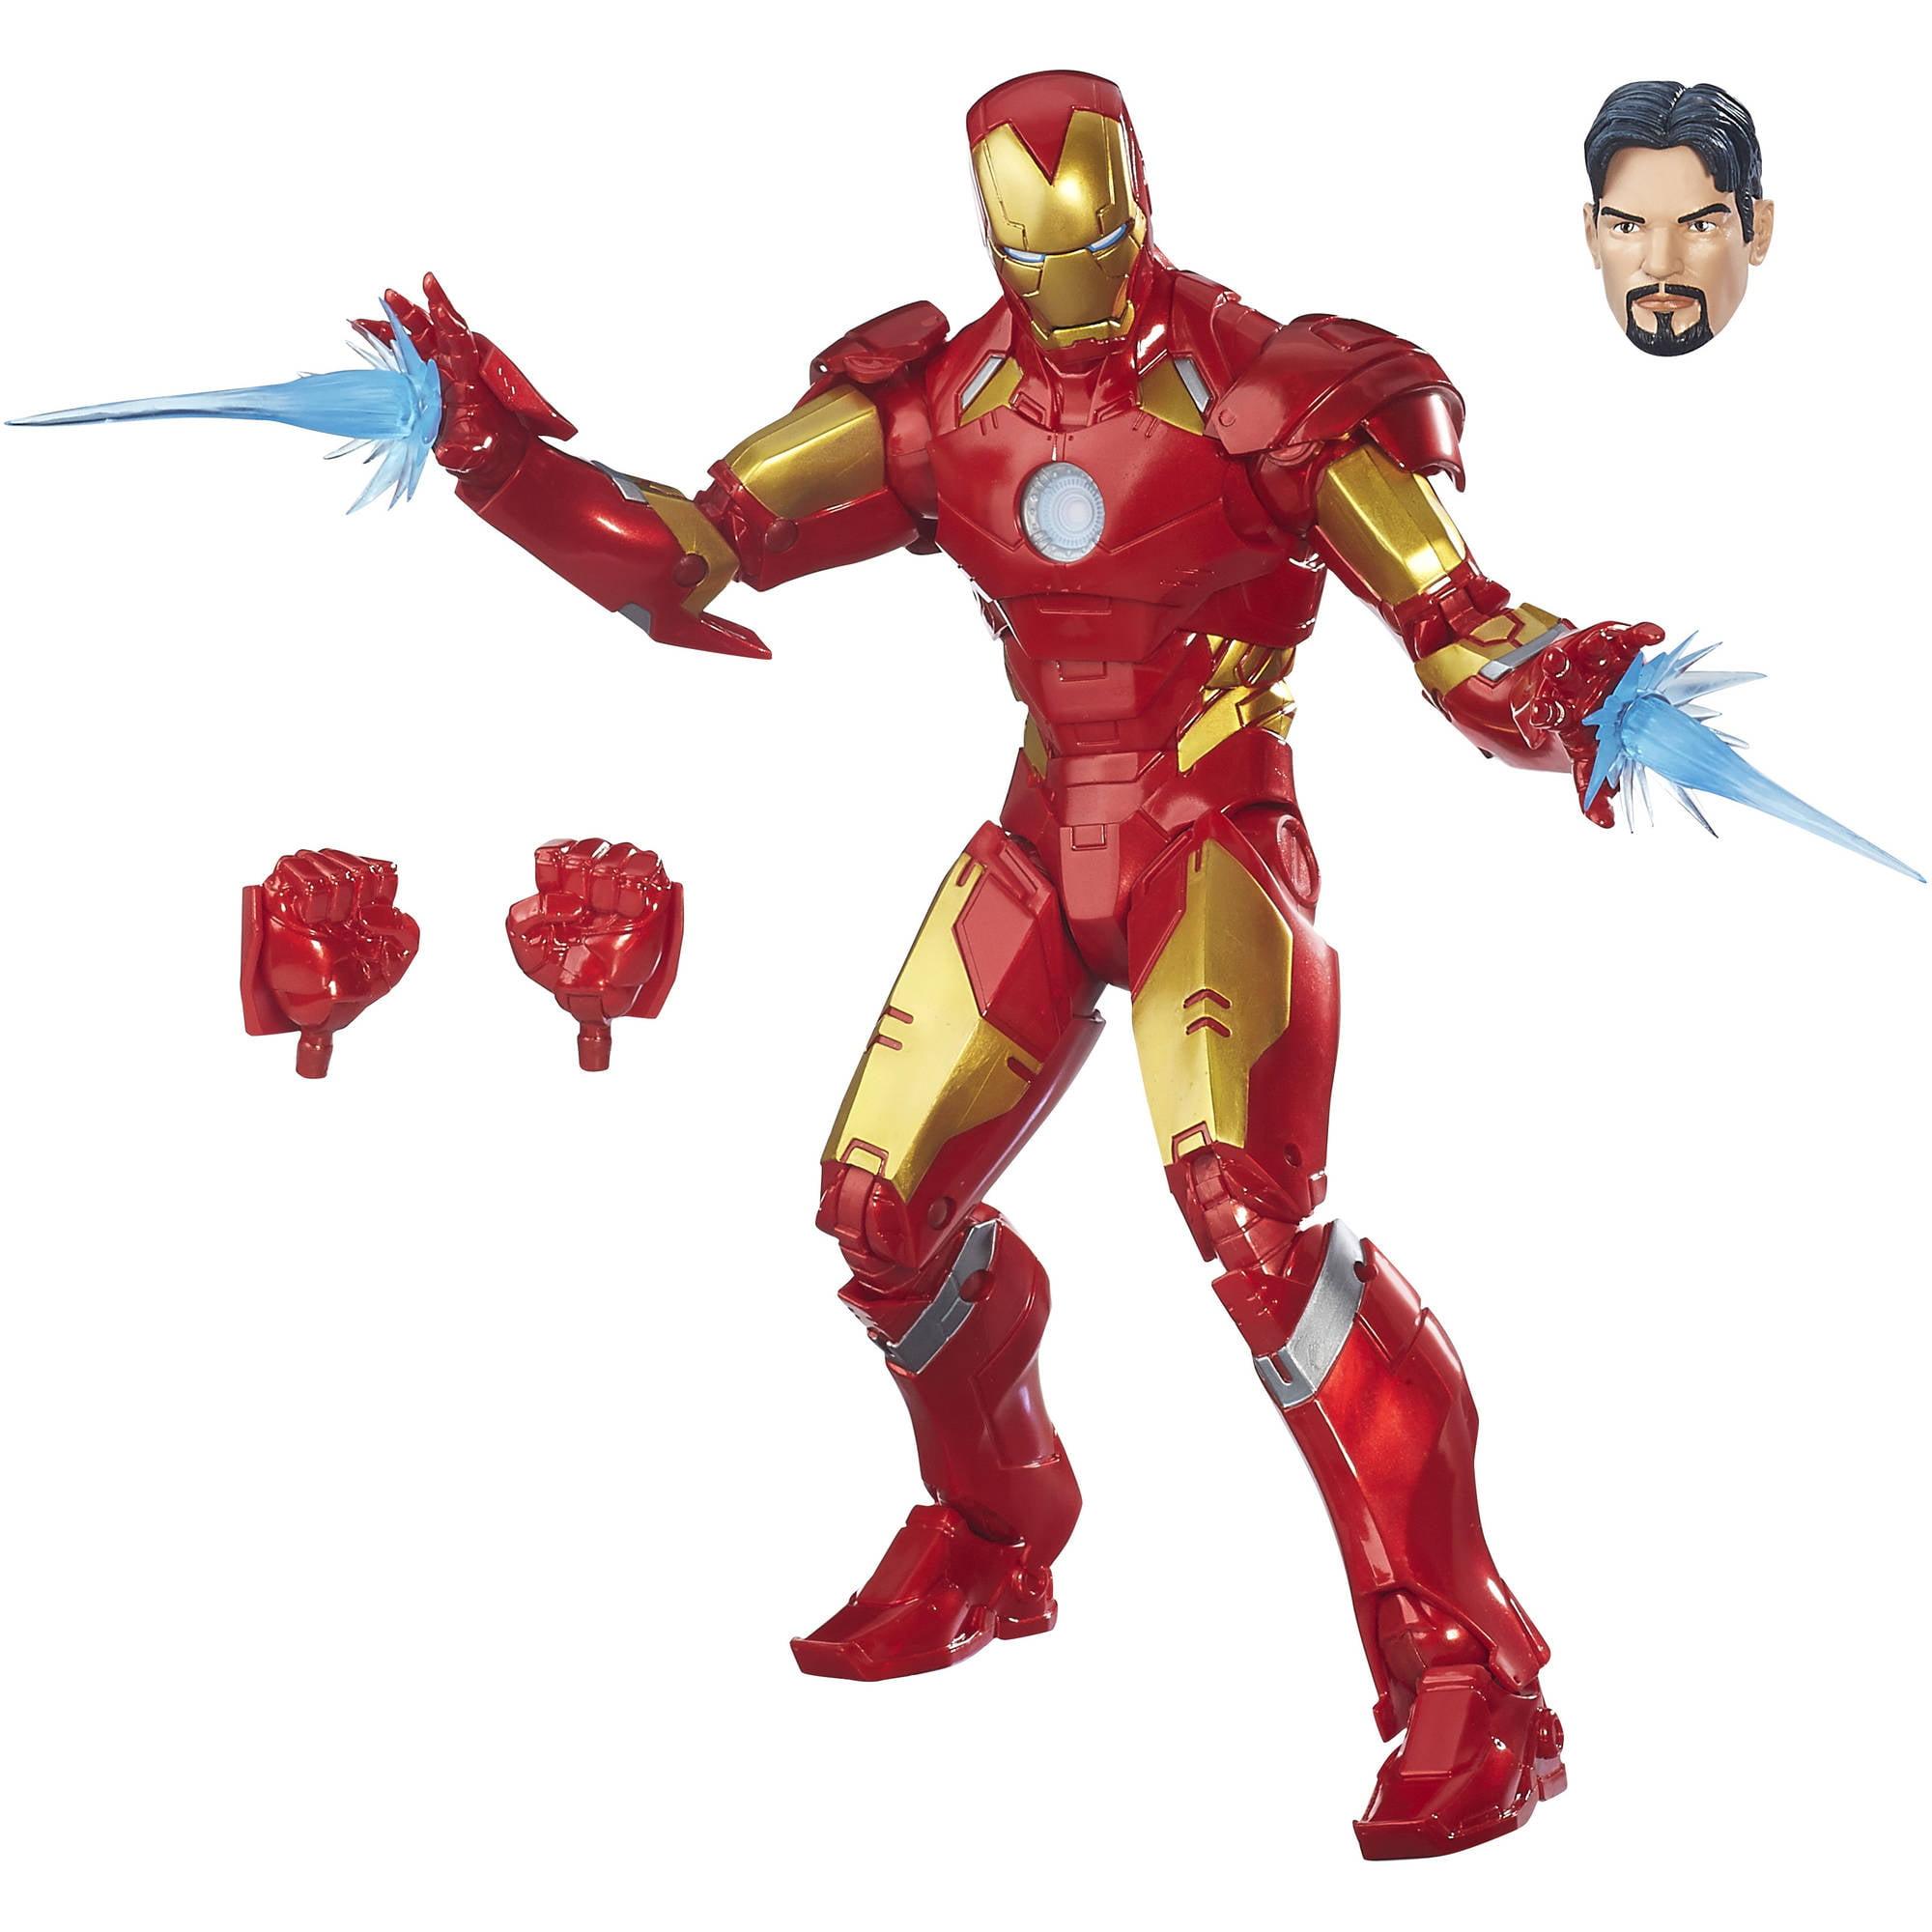 "Marvel Legends Series 12"" Iron Man"